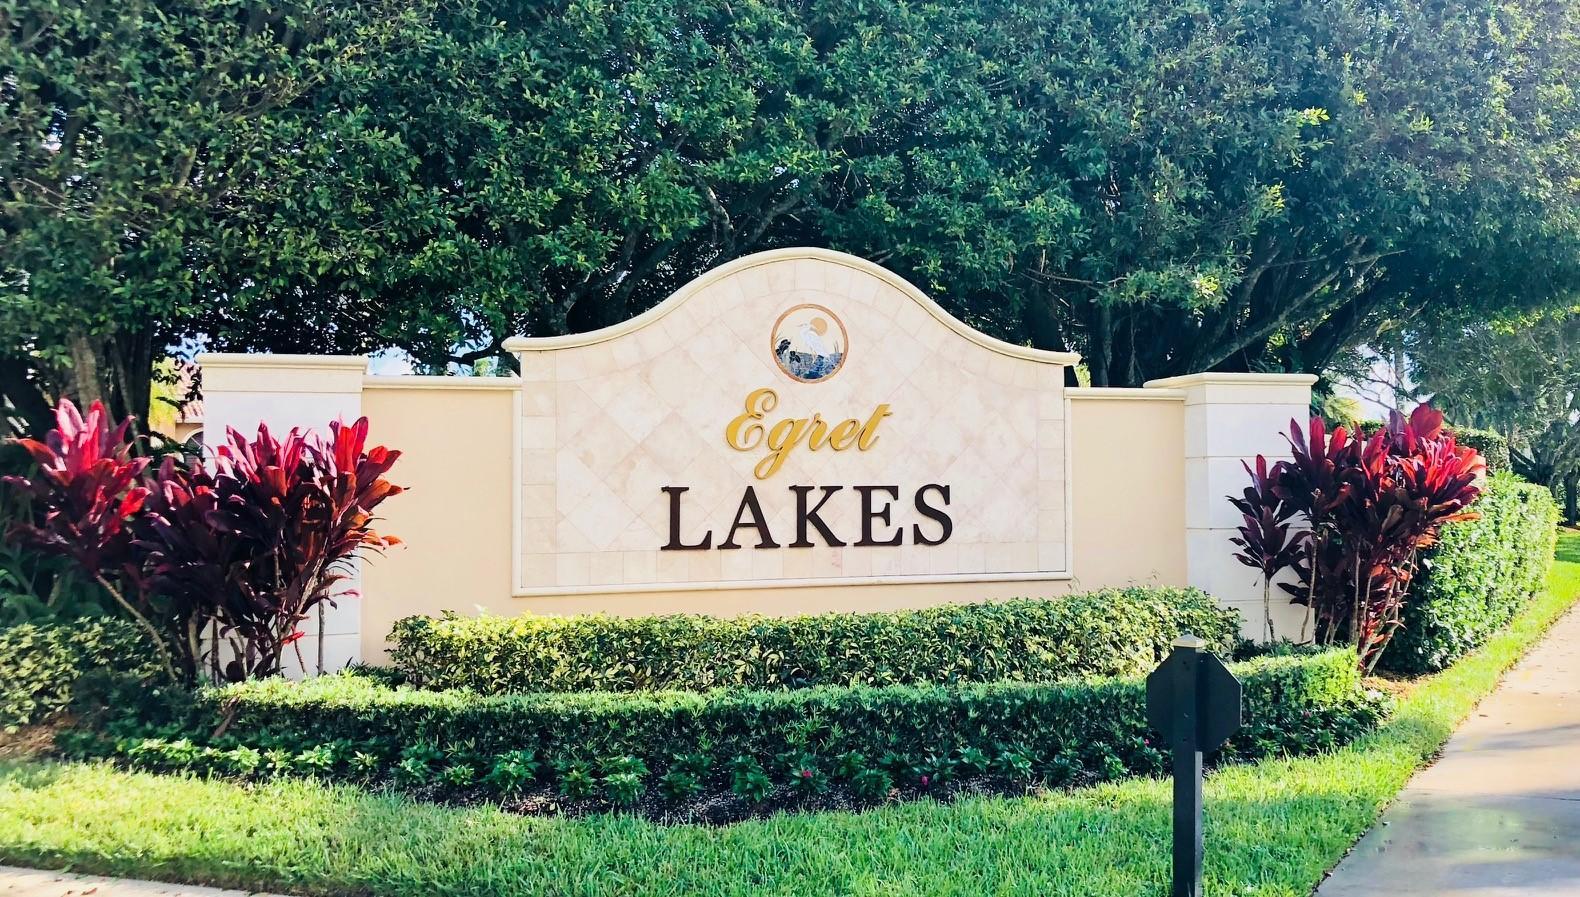 8561 Egret Lakes Lane, West Palm Beach, Florida 33412, 5 Bedrooms Bedrooms, ,4.2 BathroomsBathrooms,A,Single family,Egret Lakes,RX-10480714